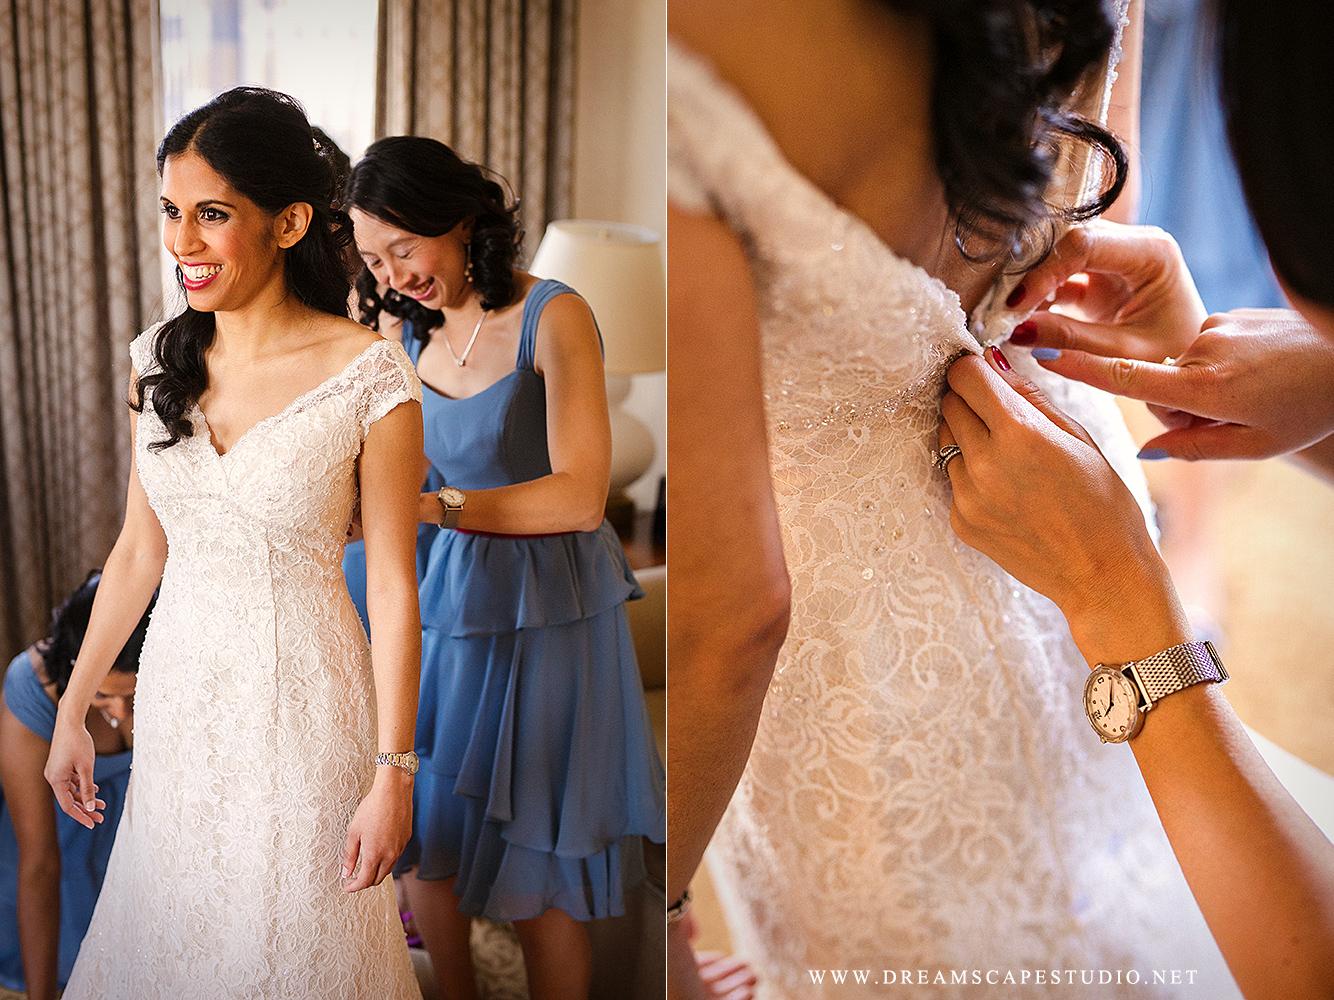 CT_Wedding_Photographer_PaHe_Blog_01.jpg